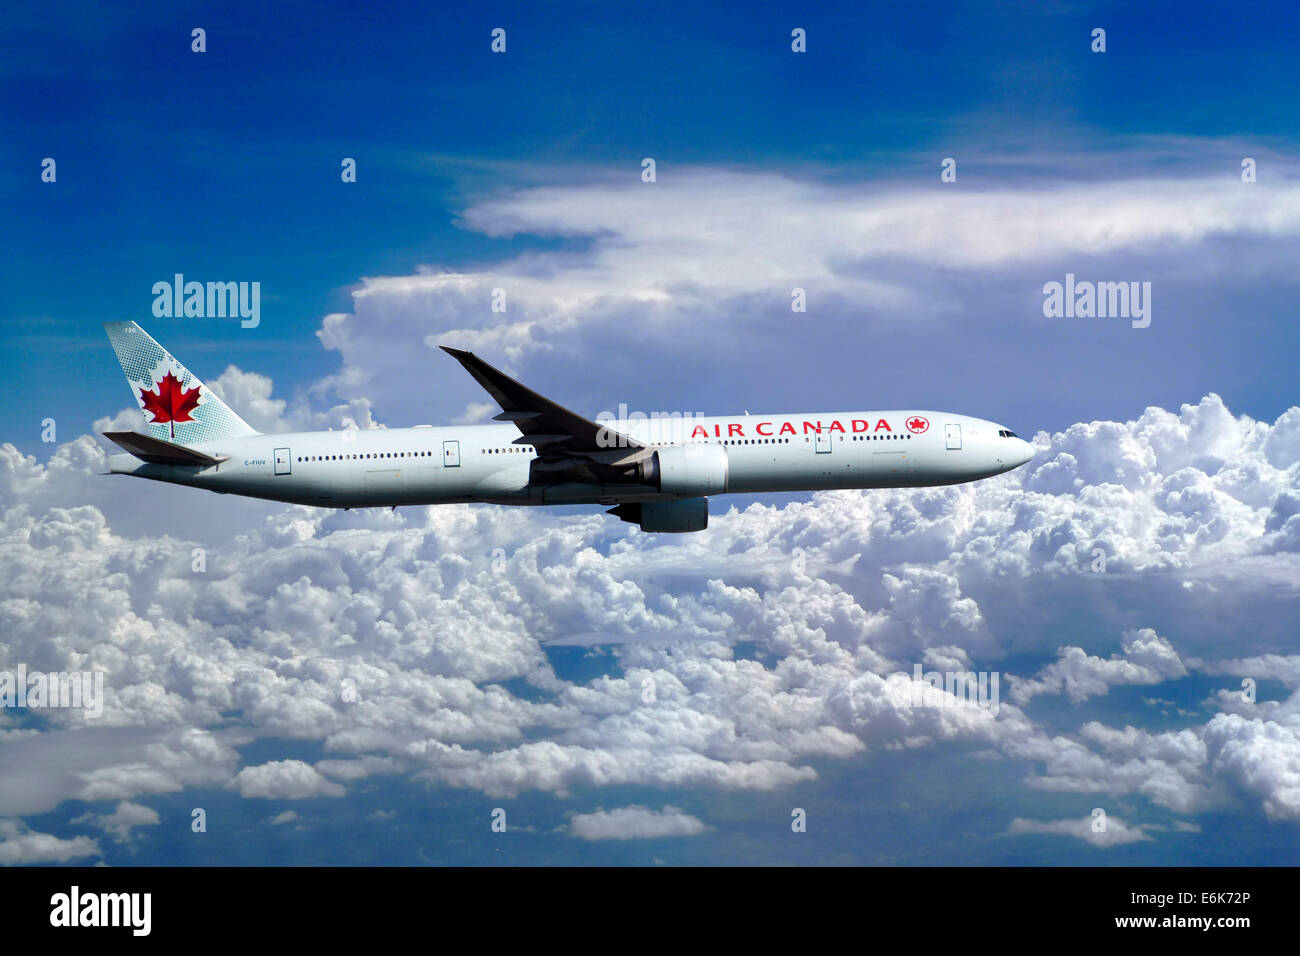 Air Canada, Boeing 777-333 ER, in flight - Stock Image